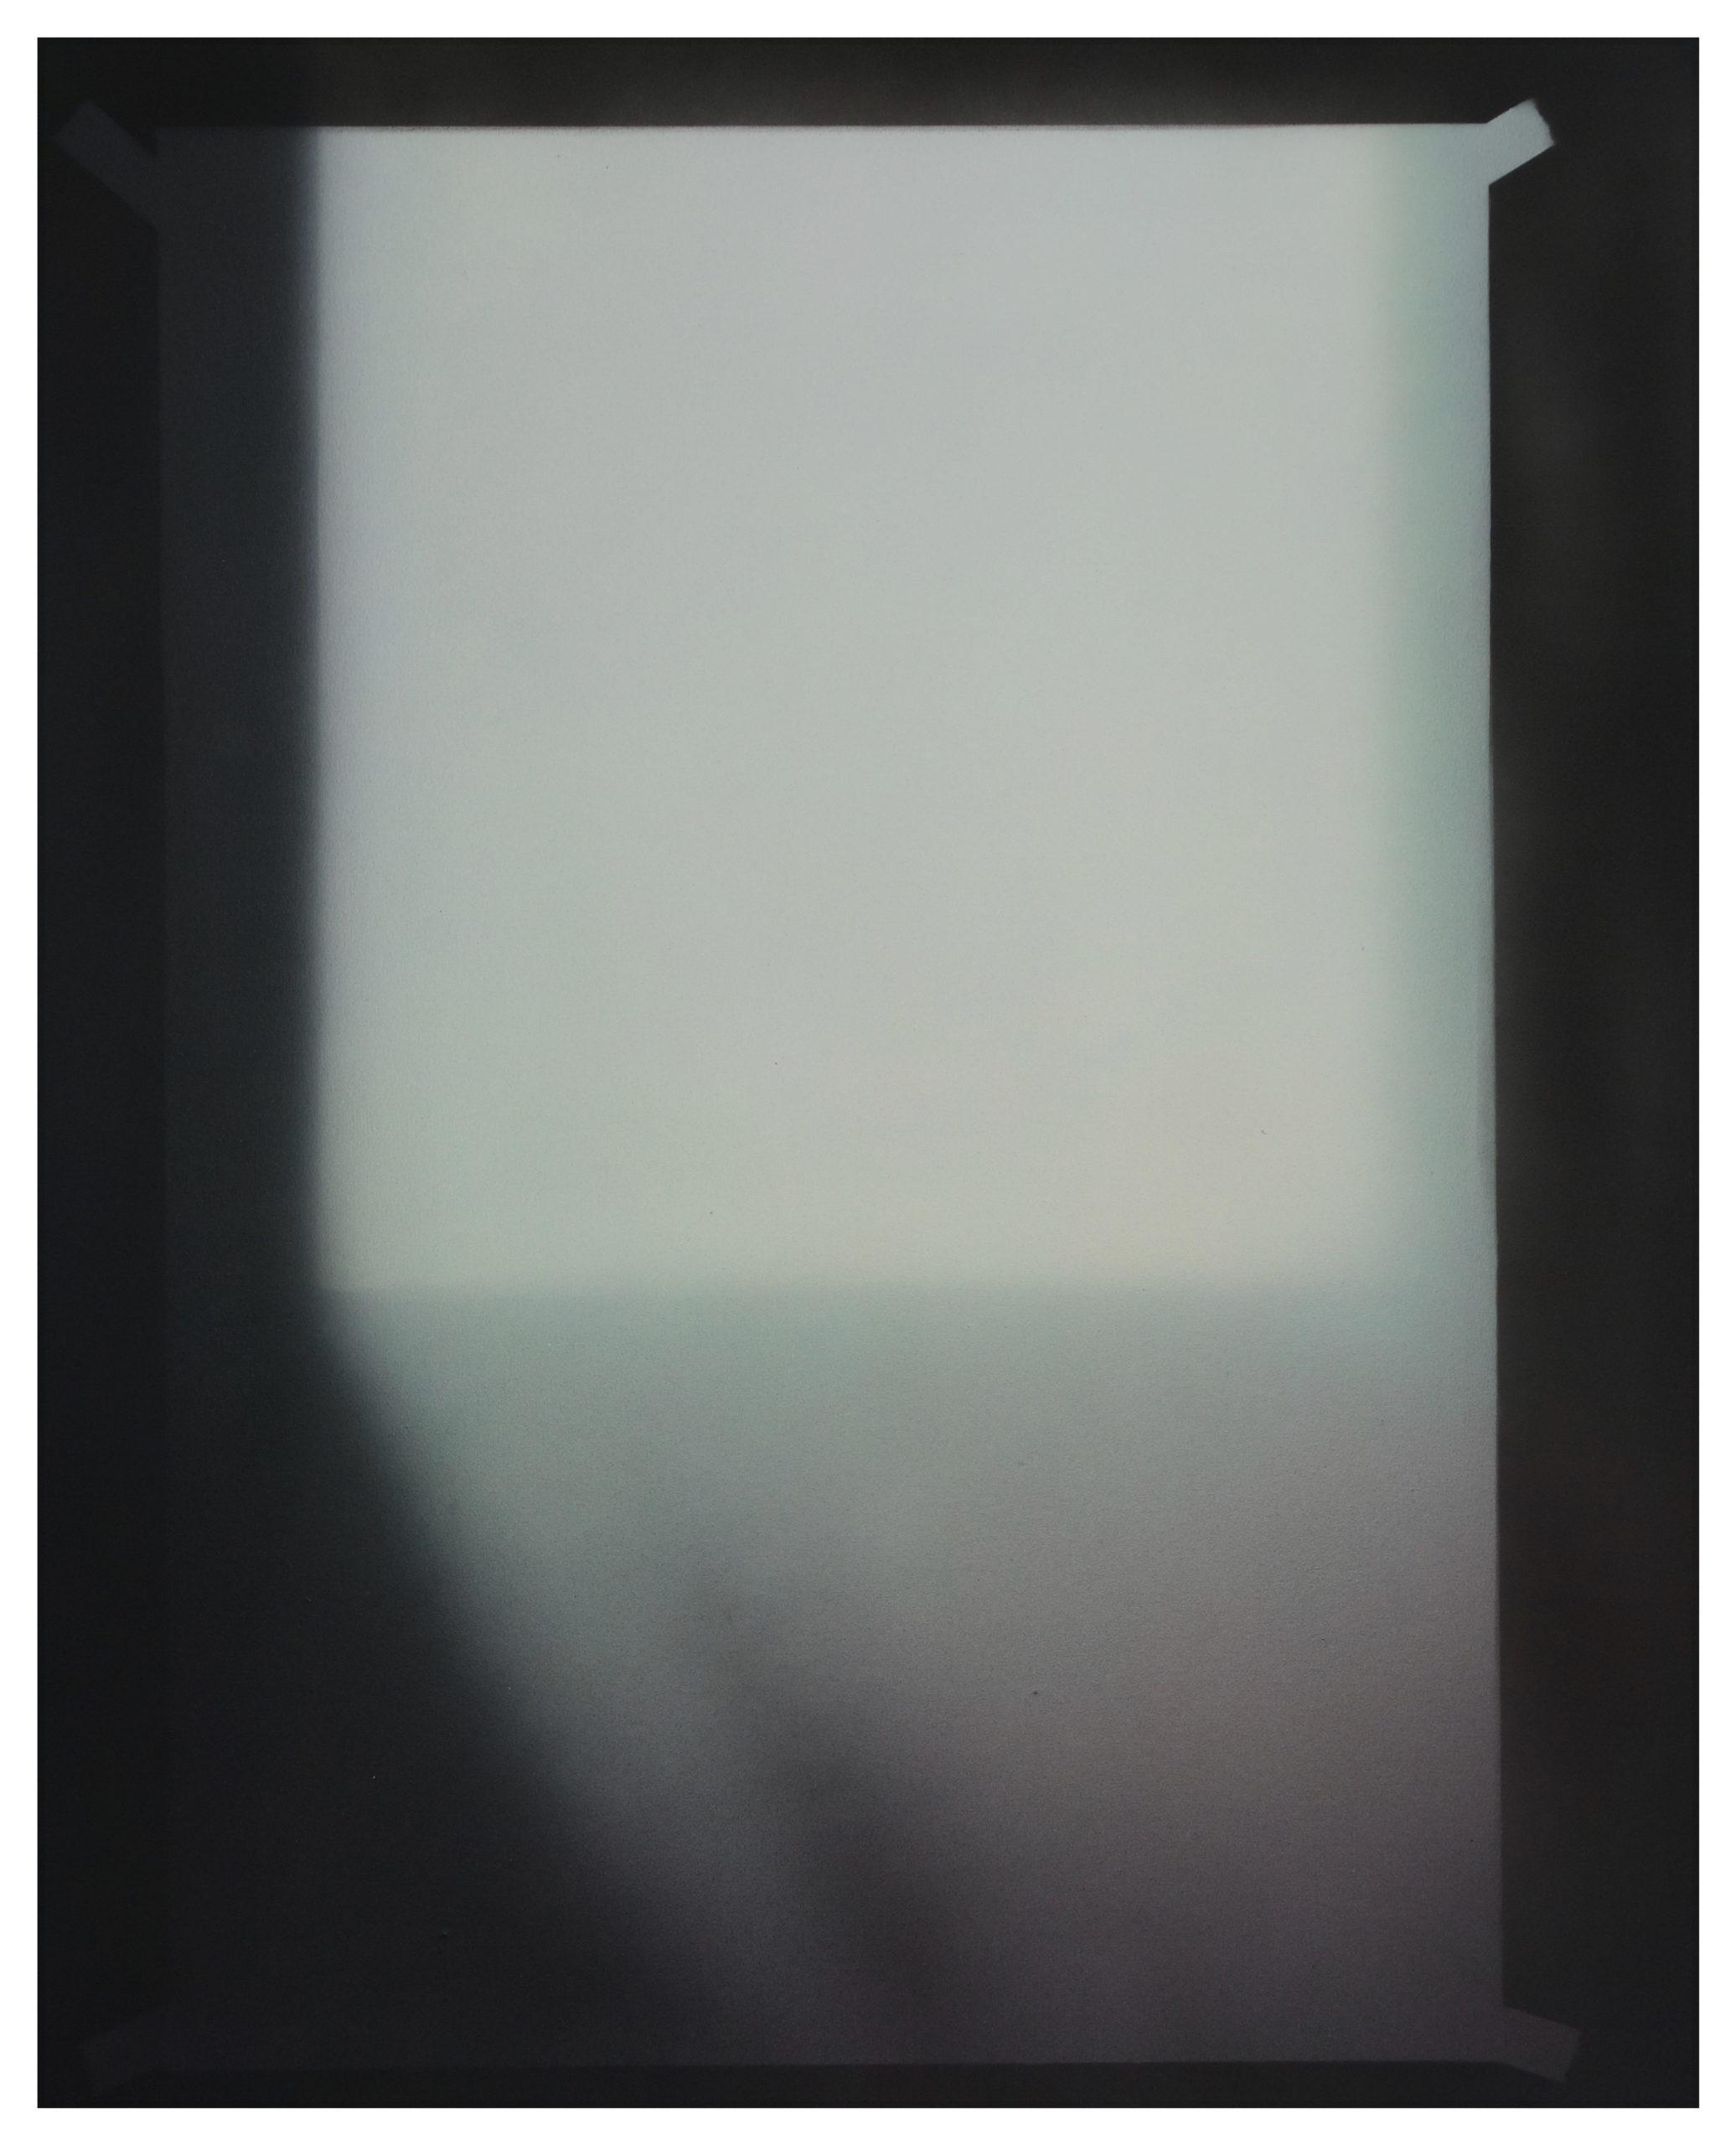 Nicolas Delprat, Put Back, James 2 acrylique sur toile 100×80 cm 2018, courtesy Nicolas Delprat